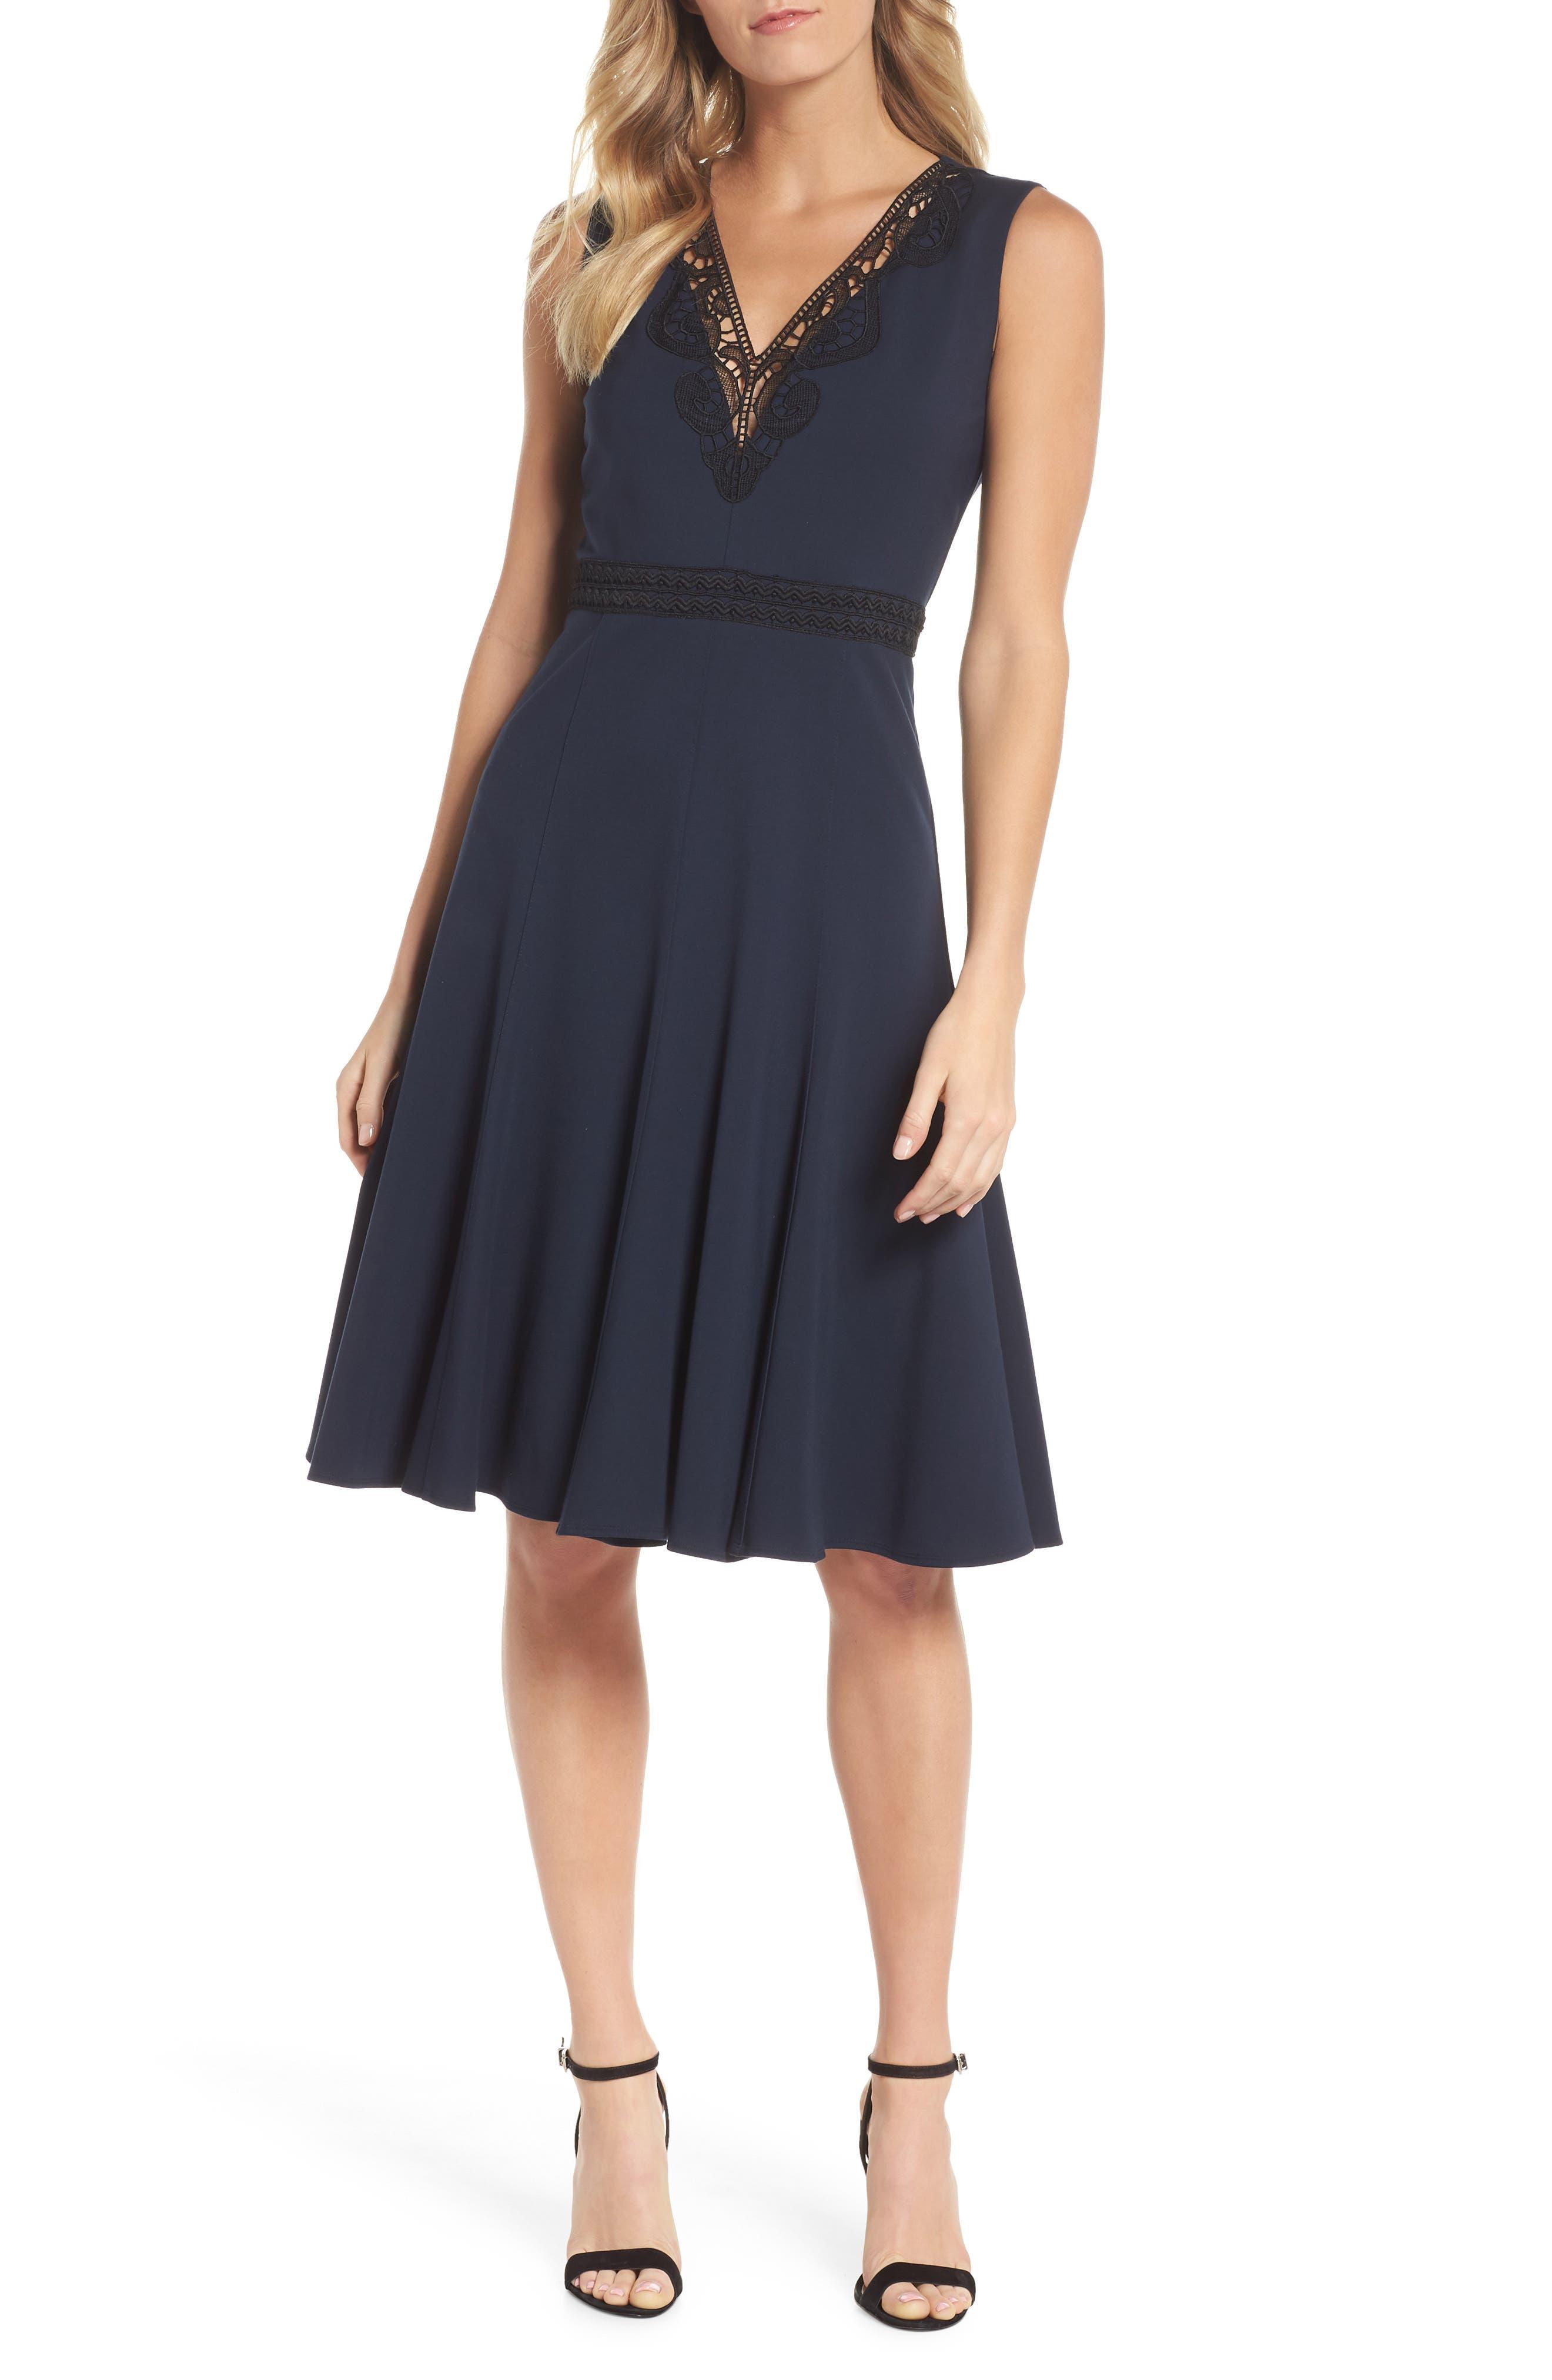 Hazel Lace Trim V-Neck Dress,                             Main thumbnail 1, color,                             Midnight Blue/ Black